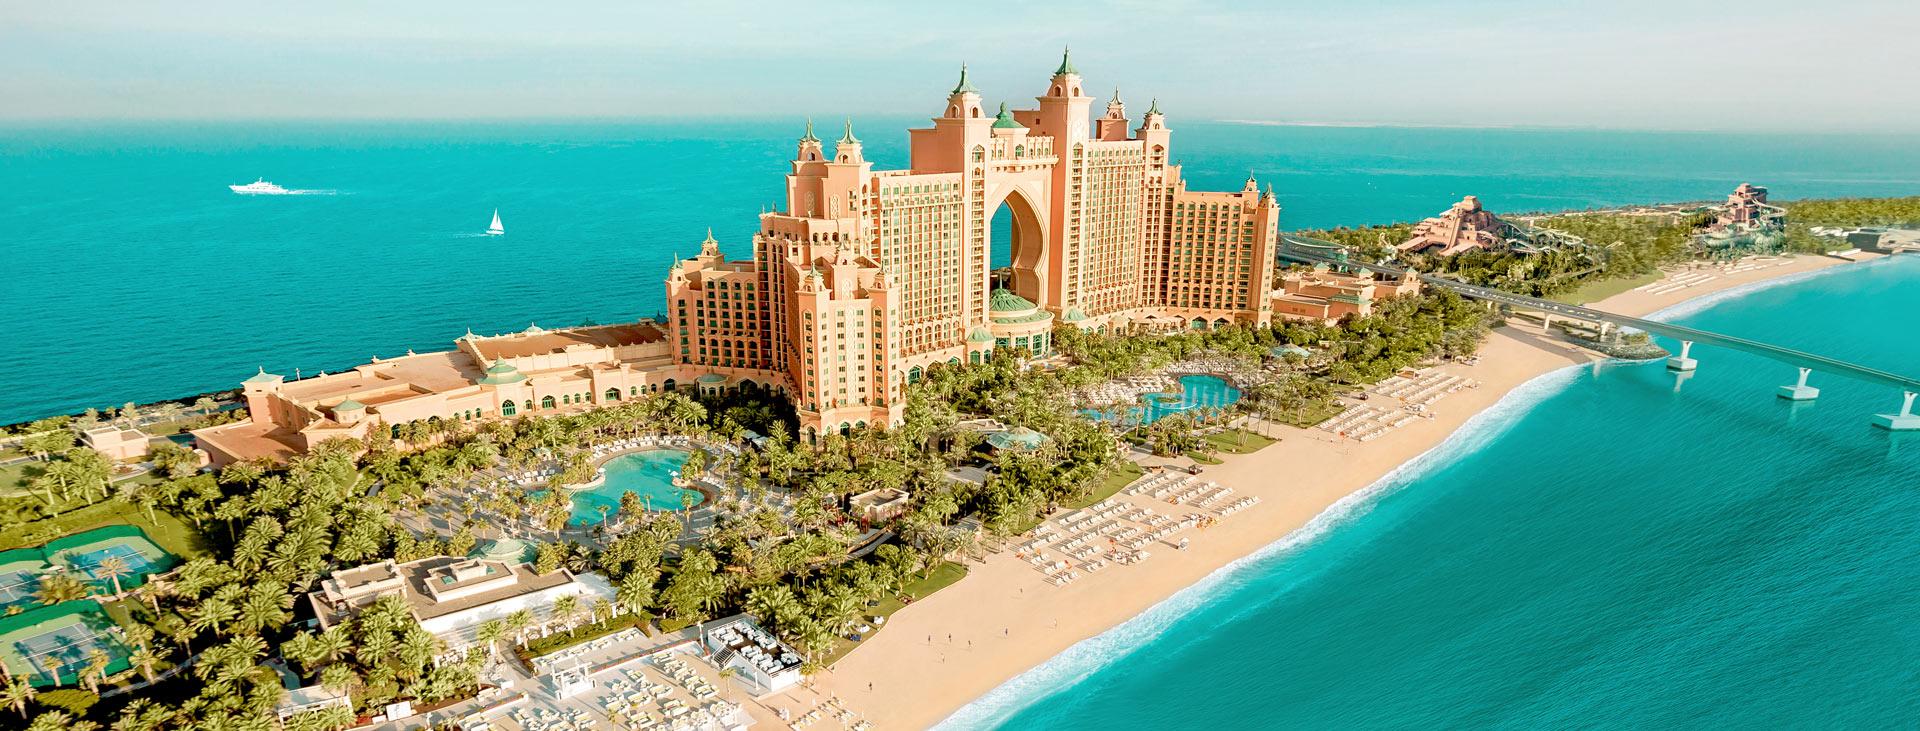 Atlantis The Palm, Jumeirah Beach, Dubai, Arabiemiraatit